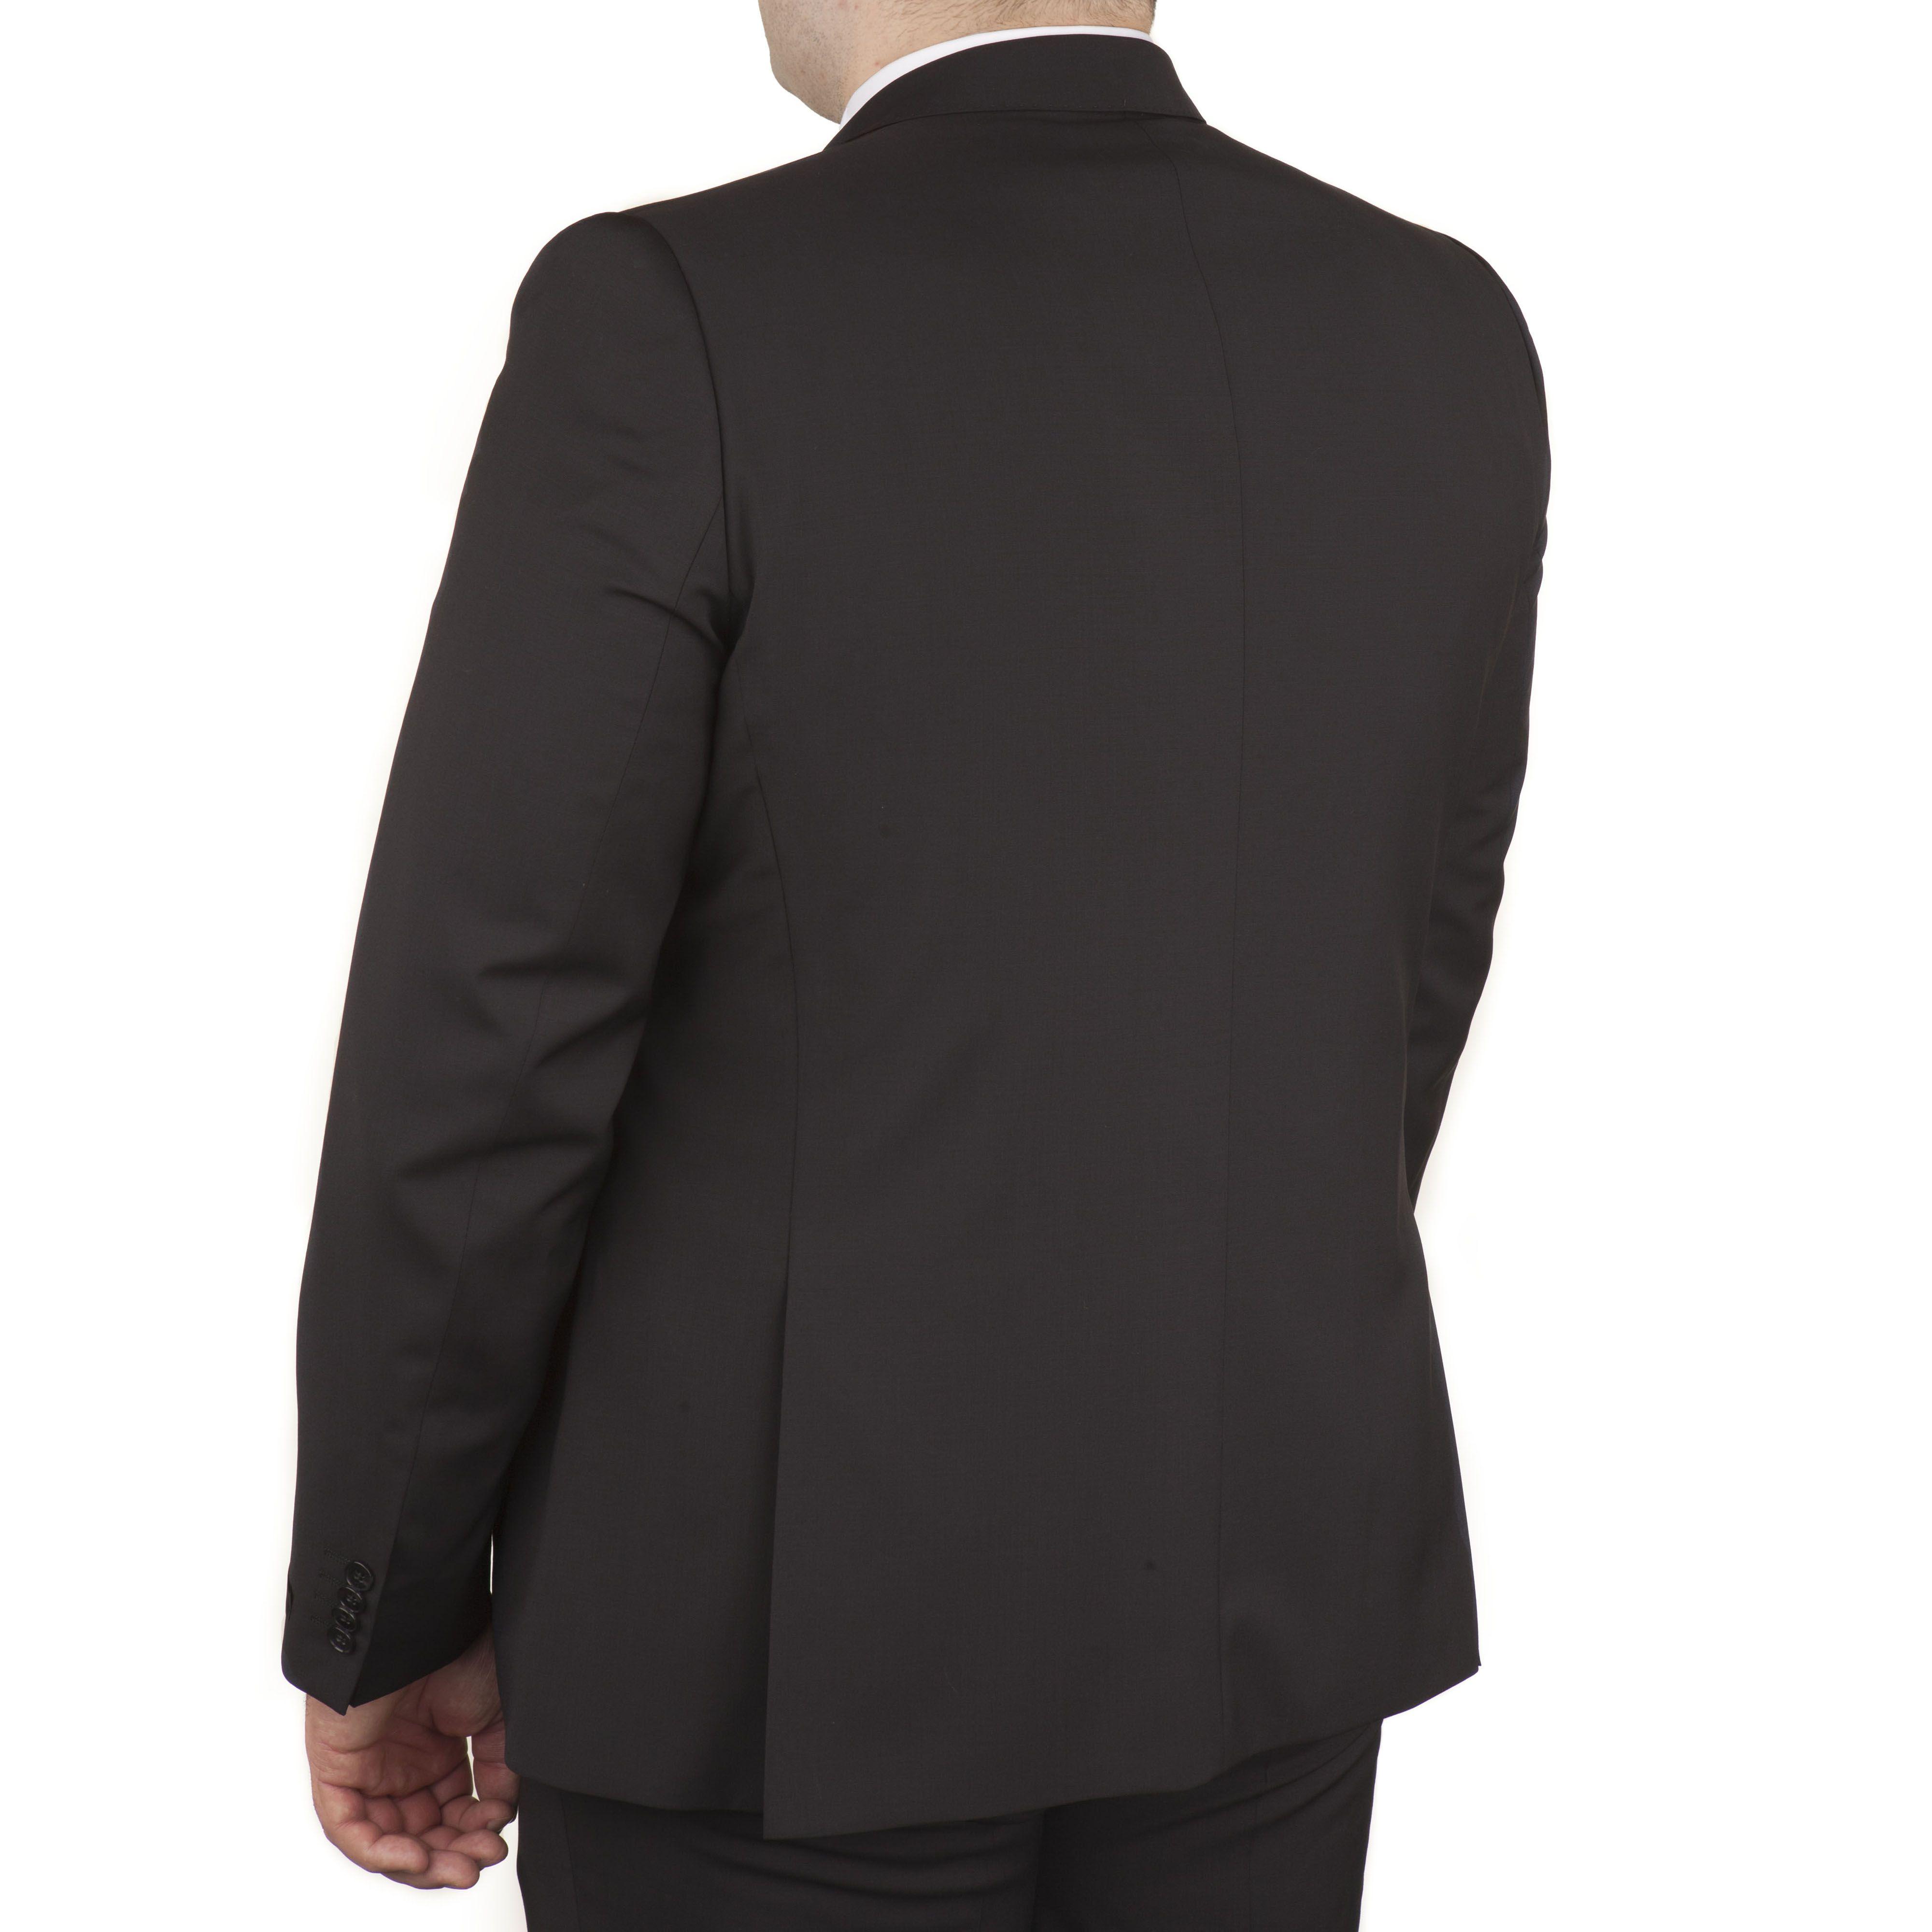 veste de costume pr f rence noire pour homme fort du 62 au 68 digel size factory digel. Black Bedroom Furniture Sets. Home Design Ideas